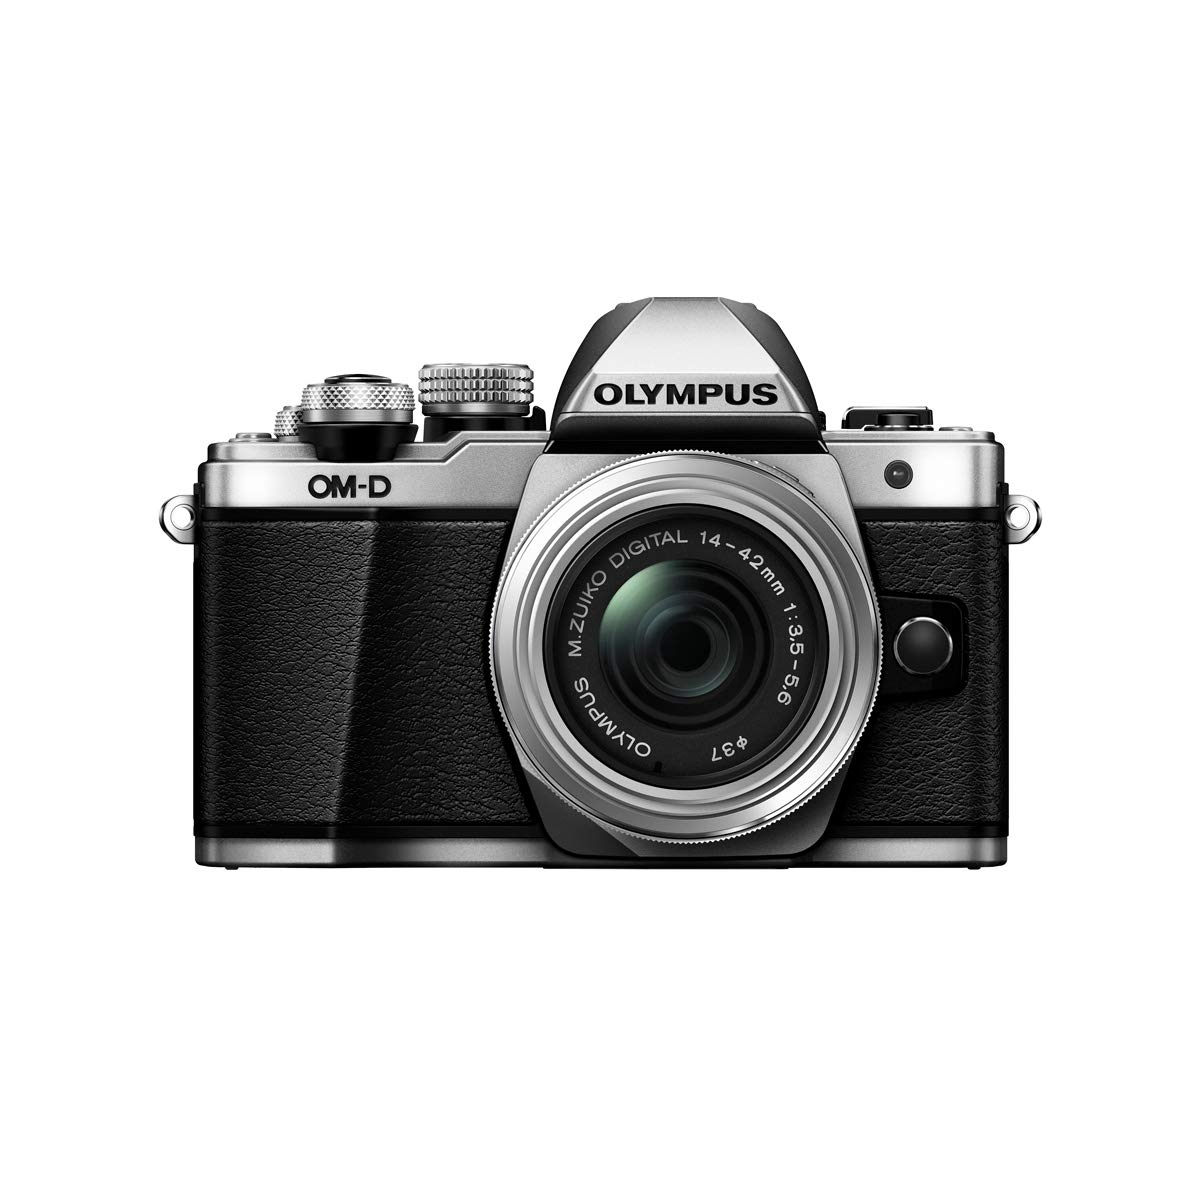 Olympus OM-D E-M10 Mark II Mirrorless Digital Camera